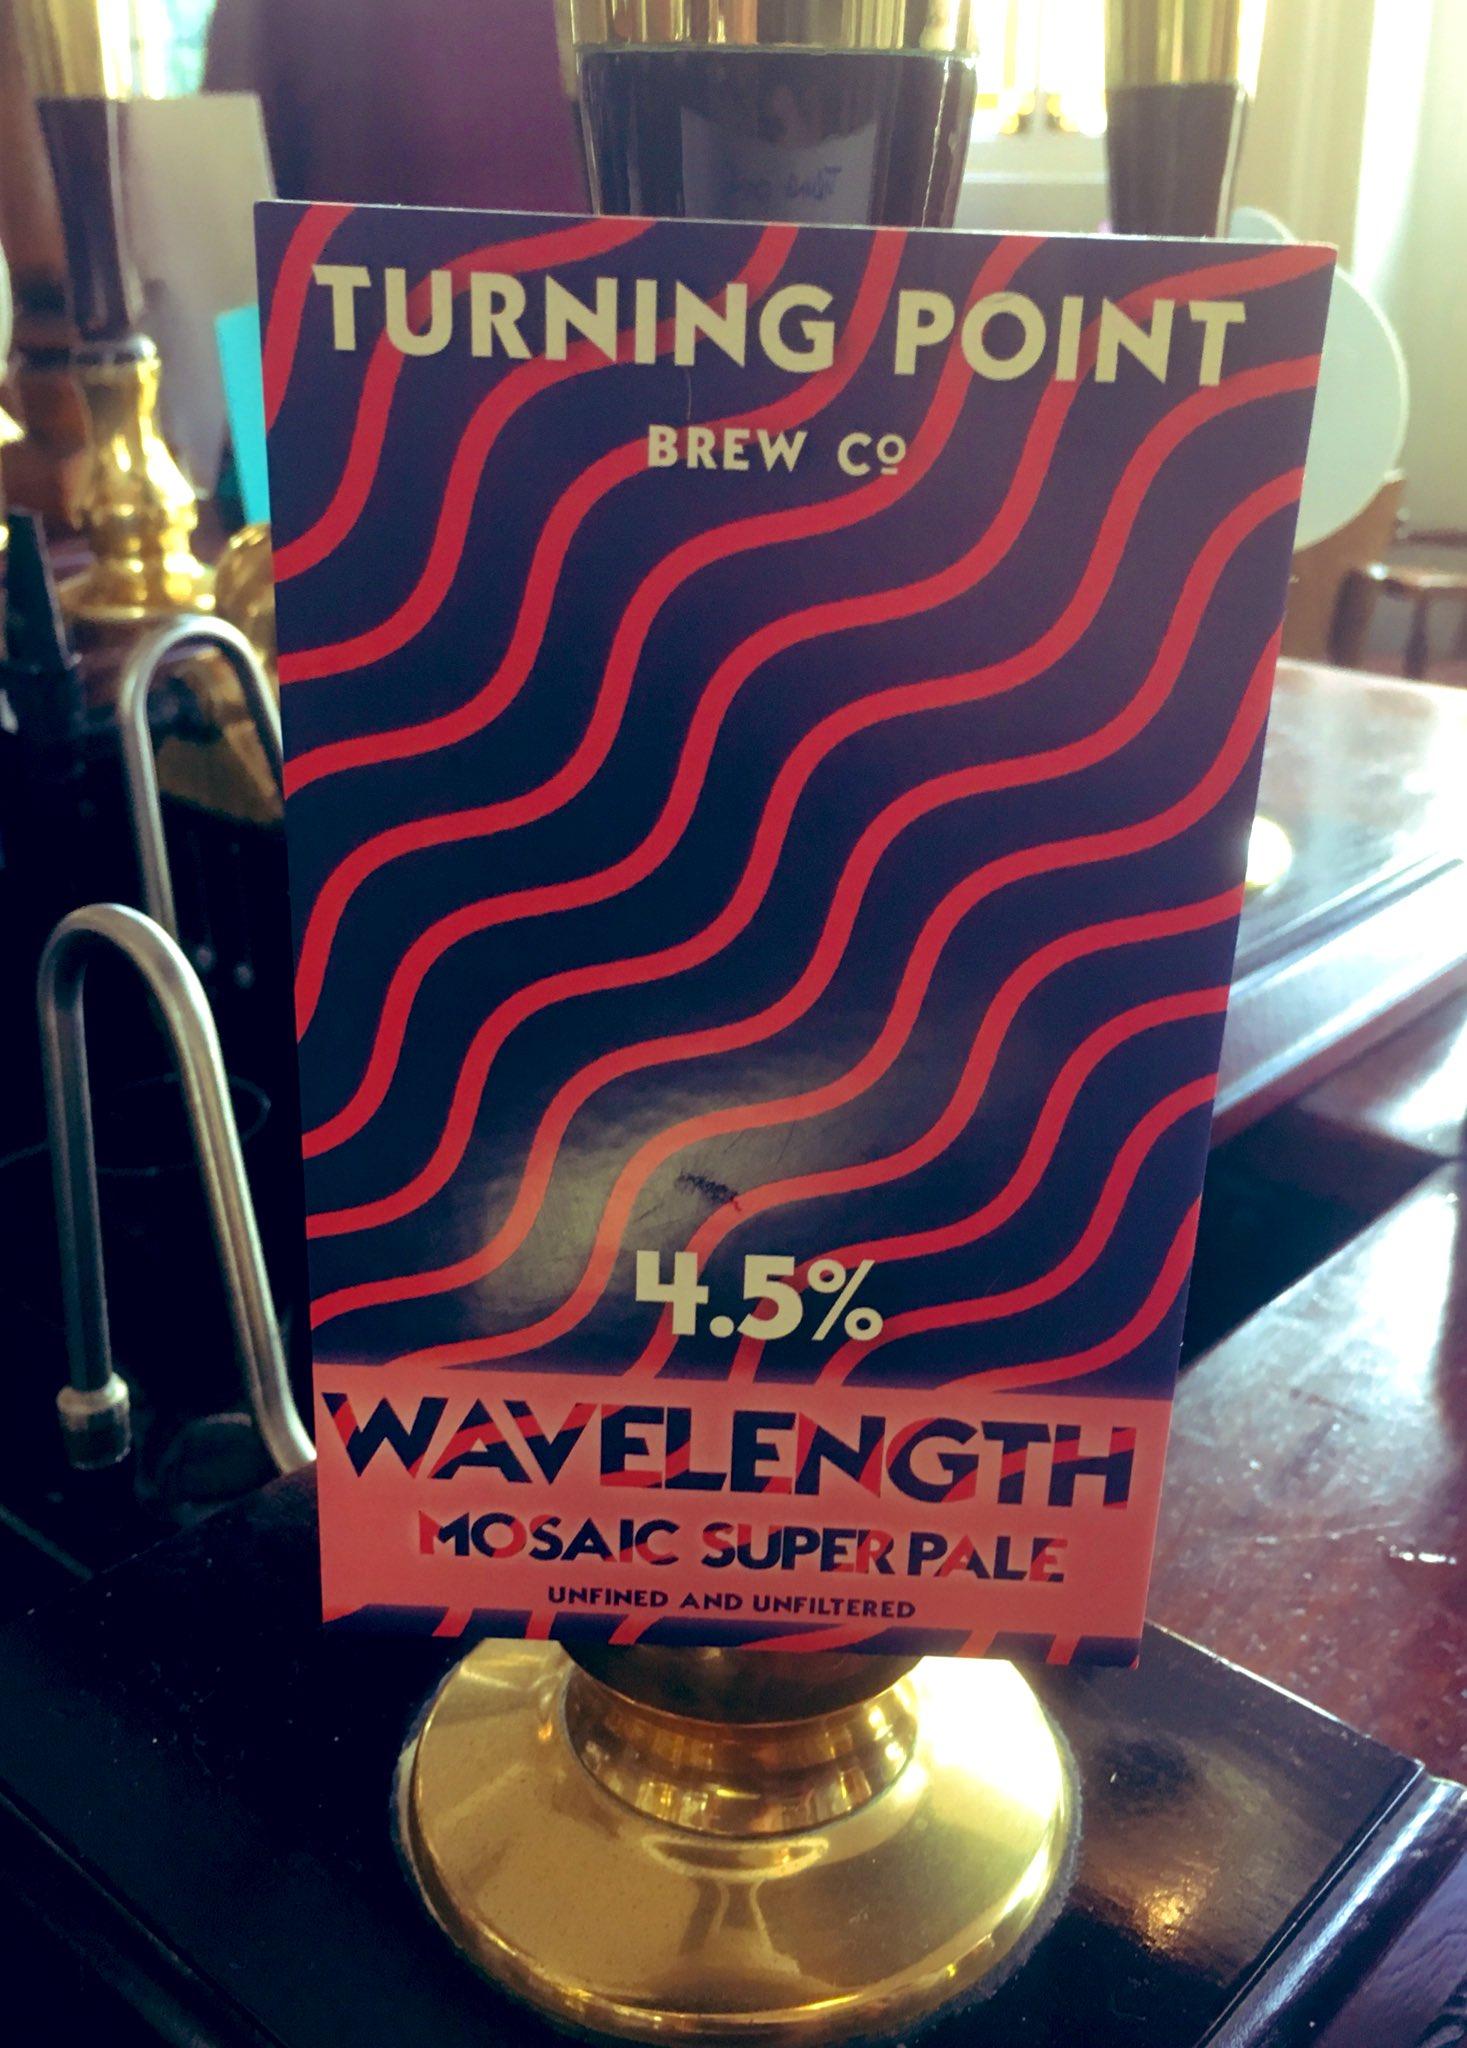 224: Wavelength